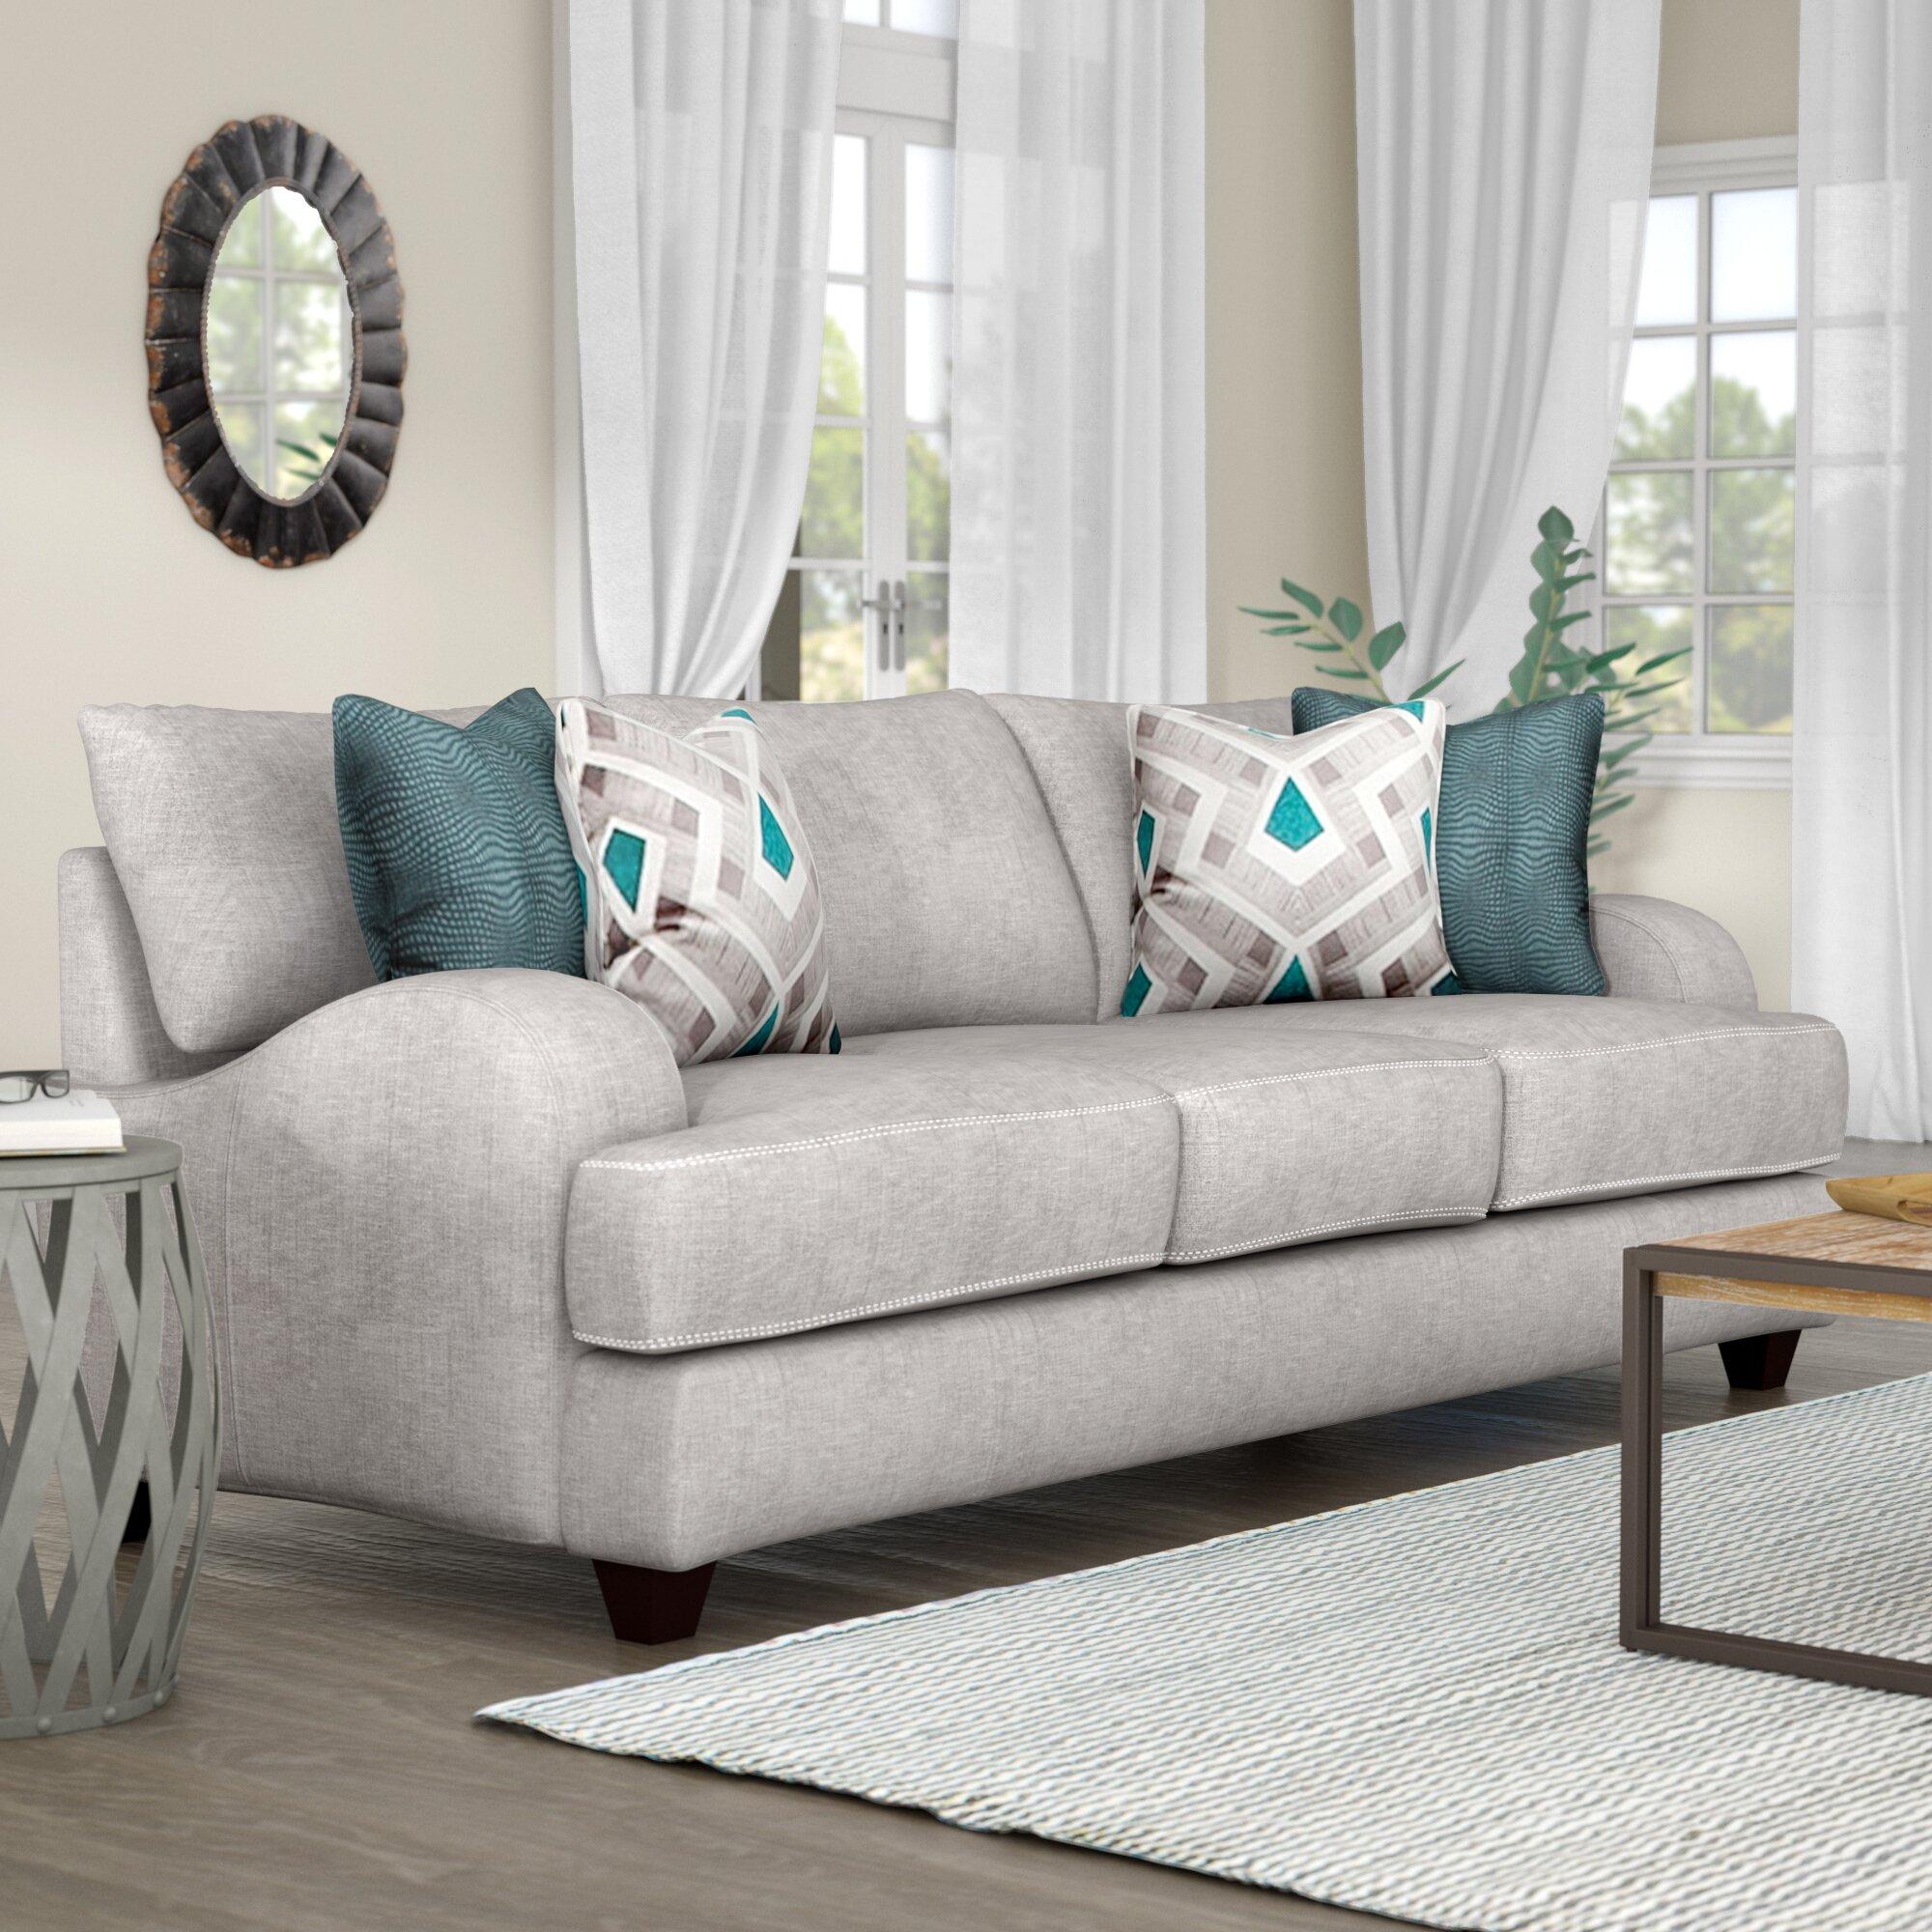 Laurel Foundry Modern Farmhouse Living Room: Laurel Foundry Modern Farmhouse Rosalie Sofa & Reviews